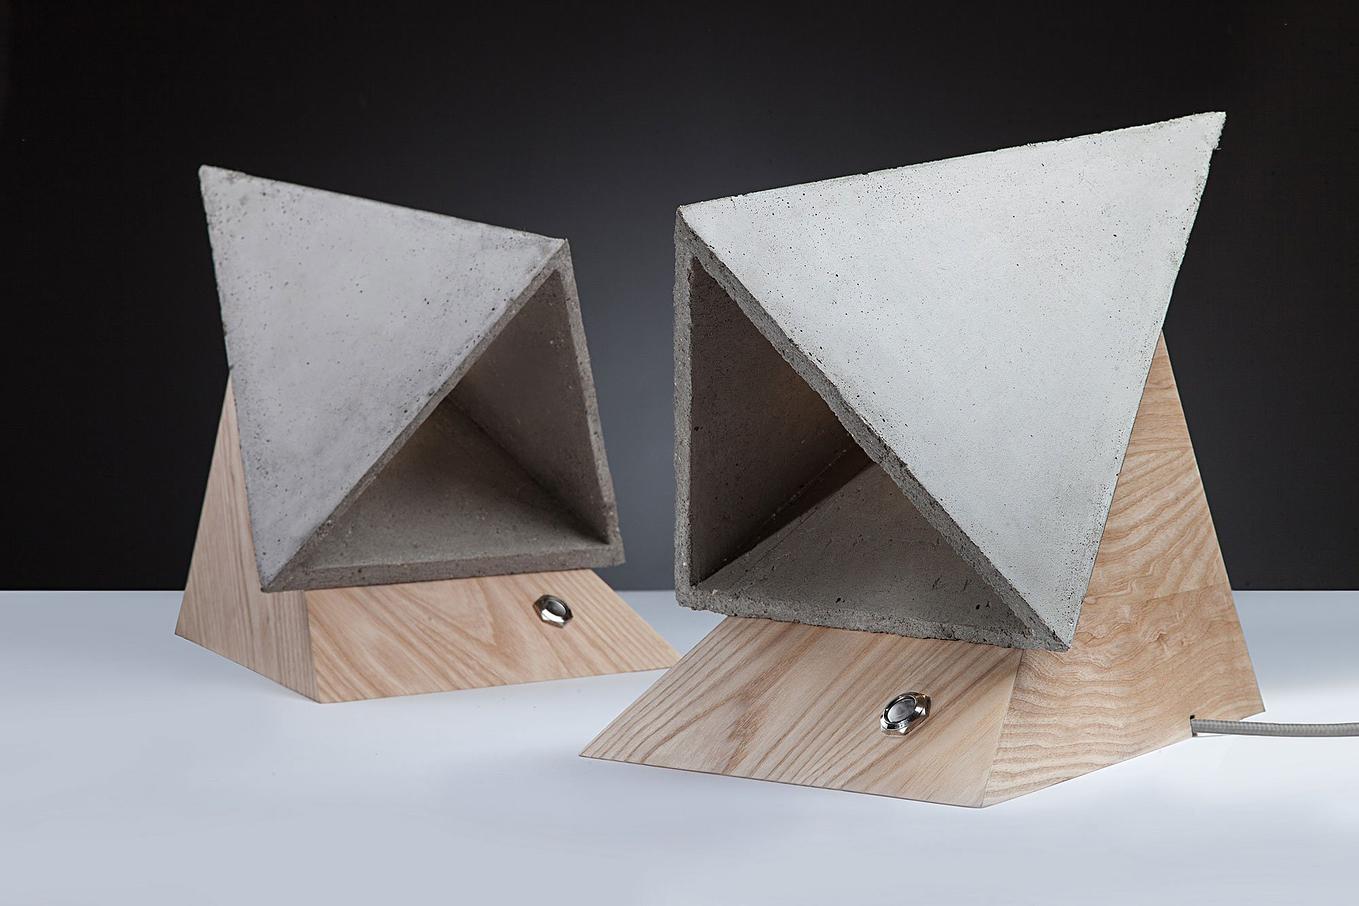 monk-concrete-lamp-by-skeld-design-4